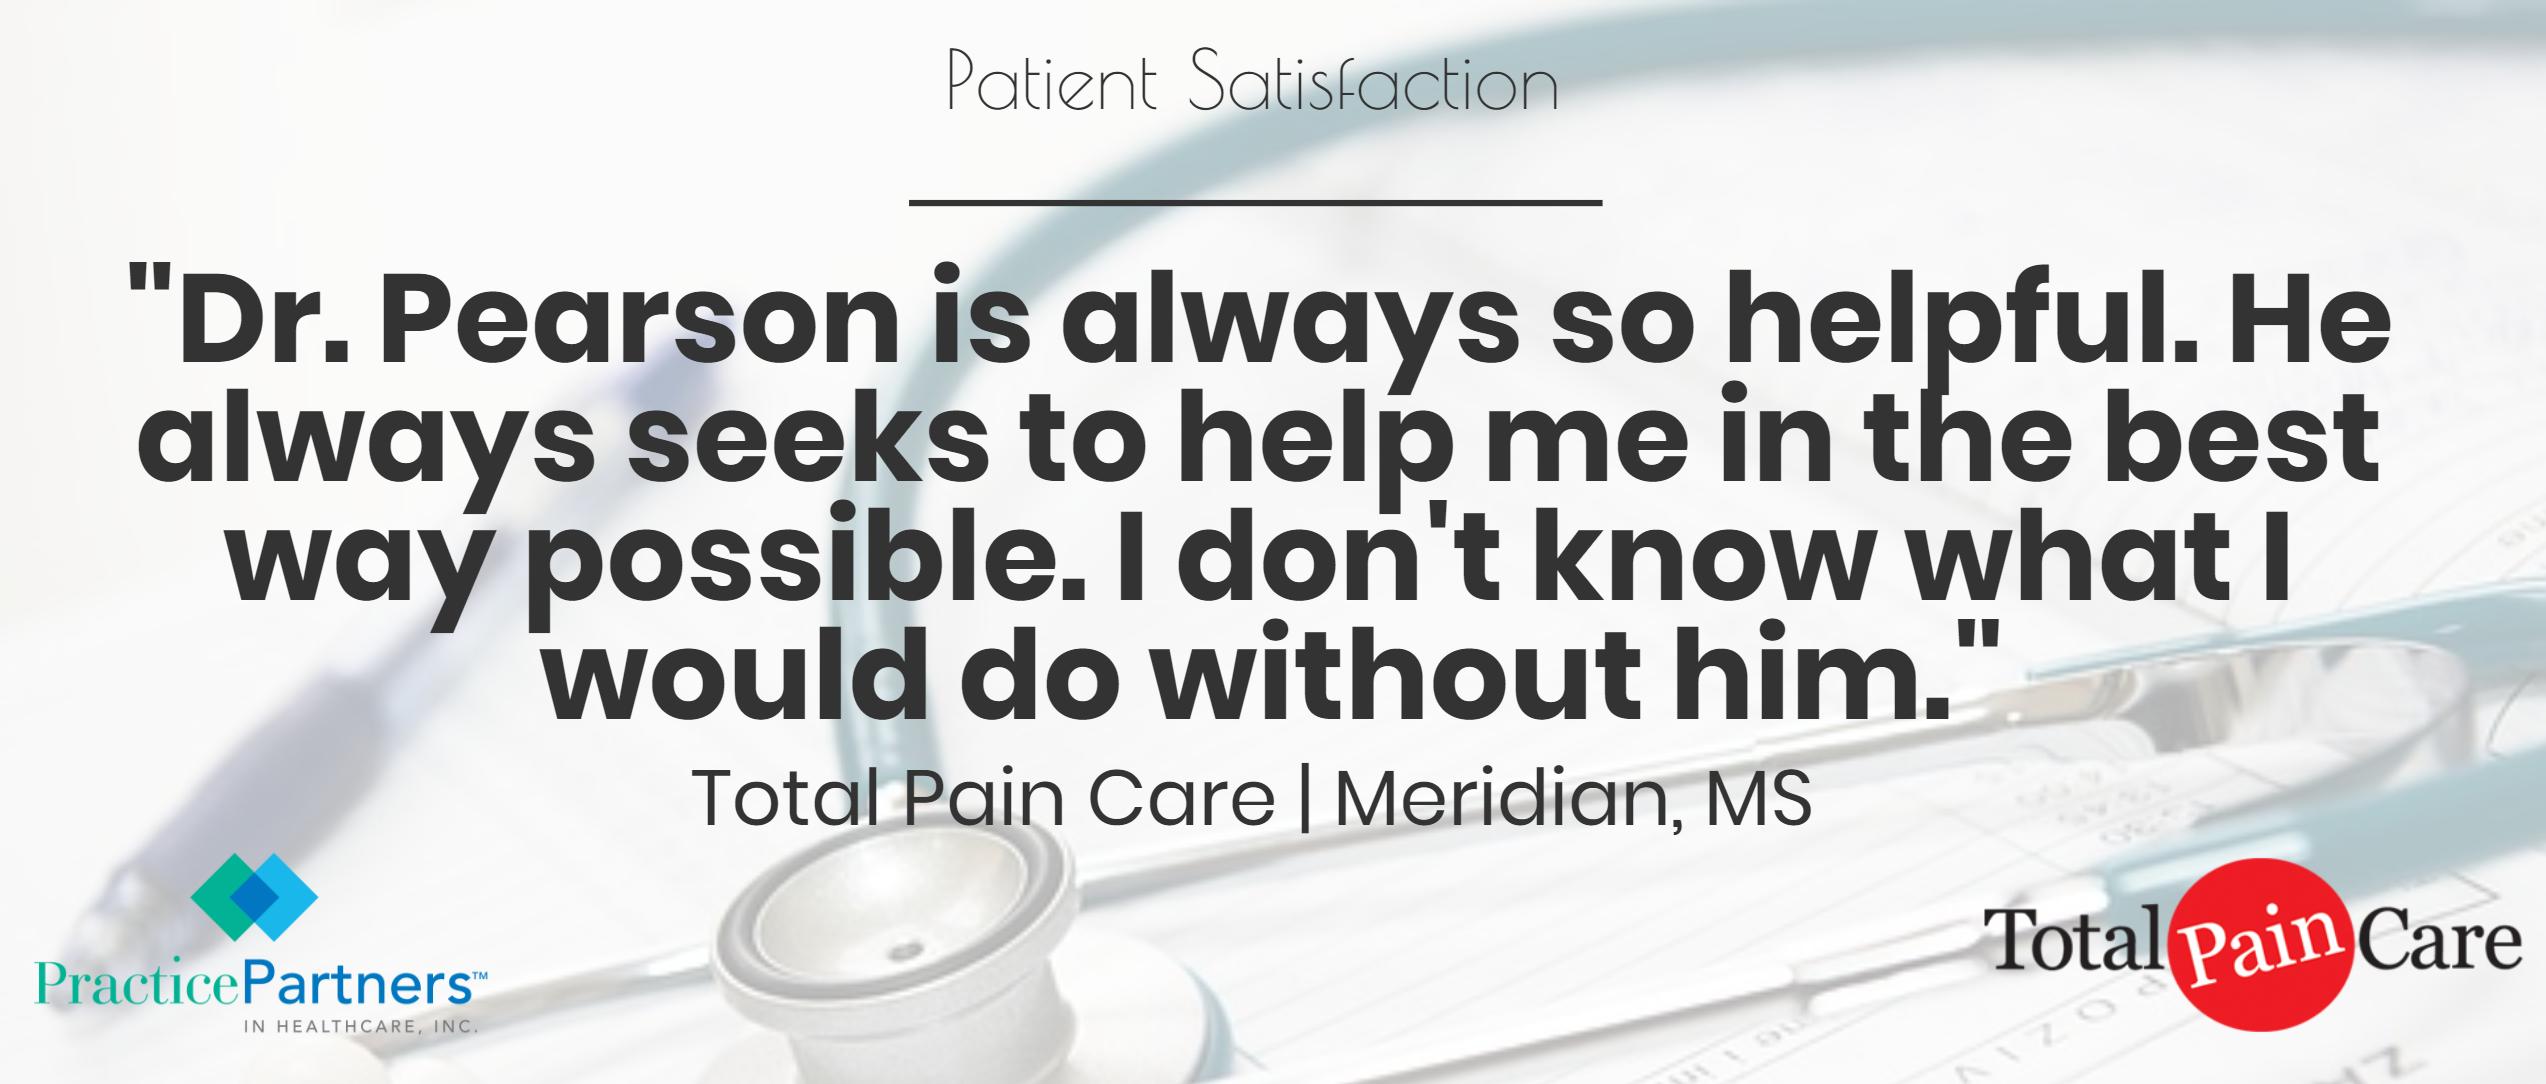 Patient Sat TPC 3 29 18